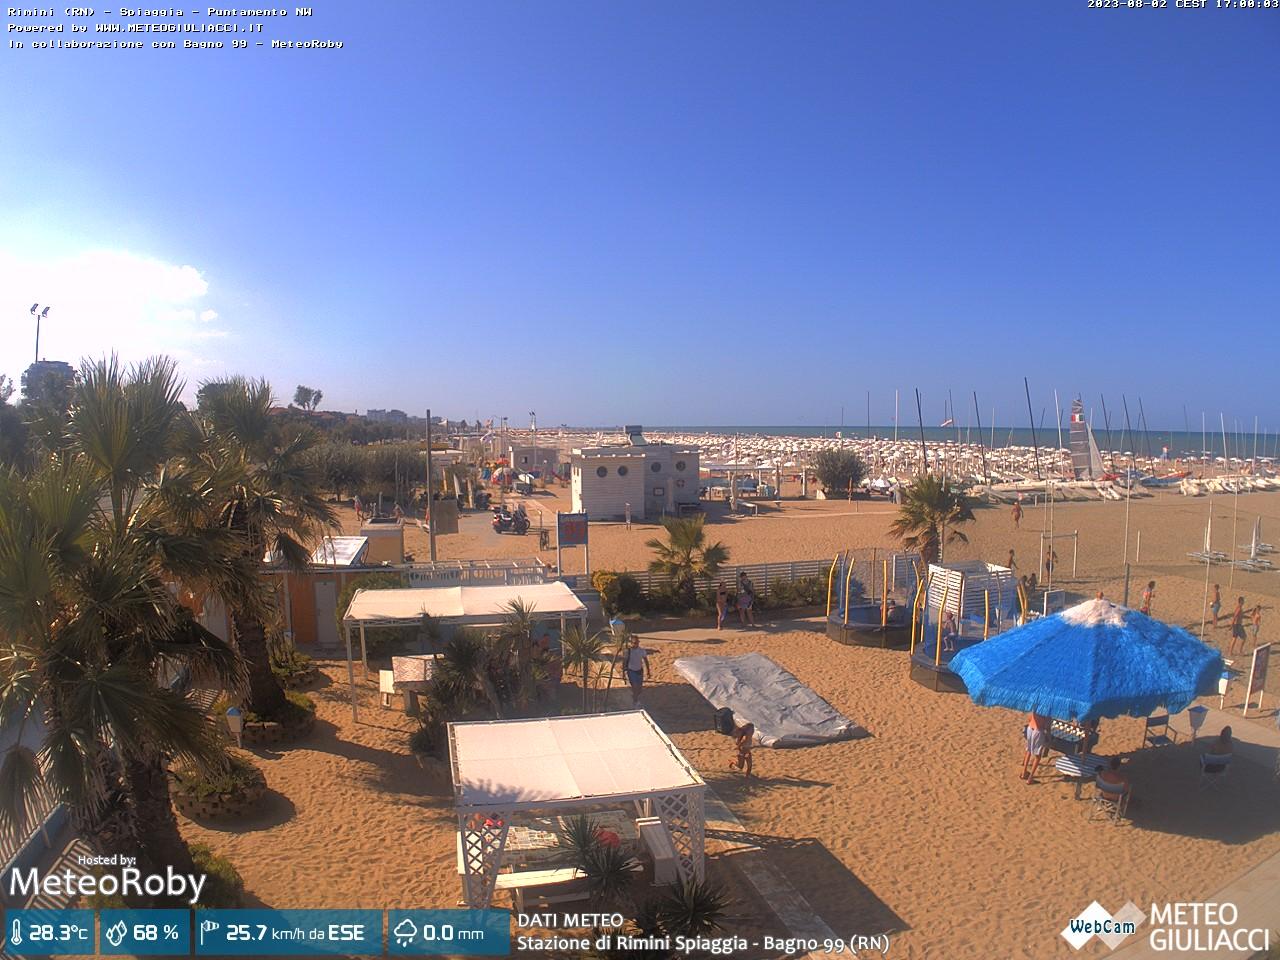 webcam Rimini - Bagno 99 Loretta MeteoRoby (RN)